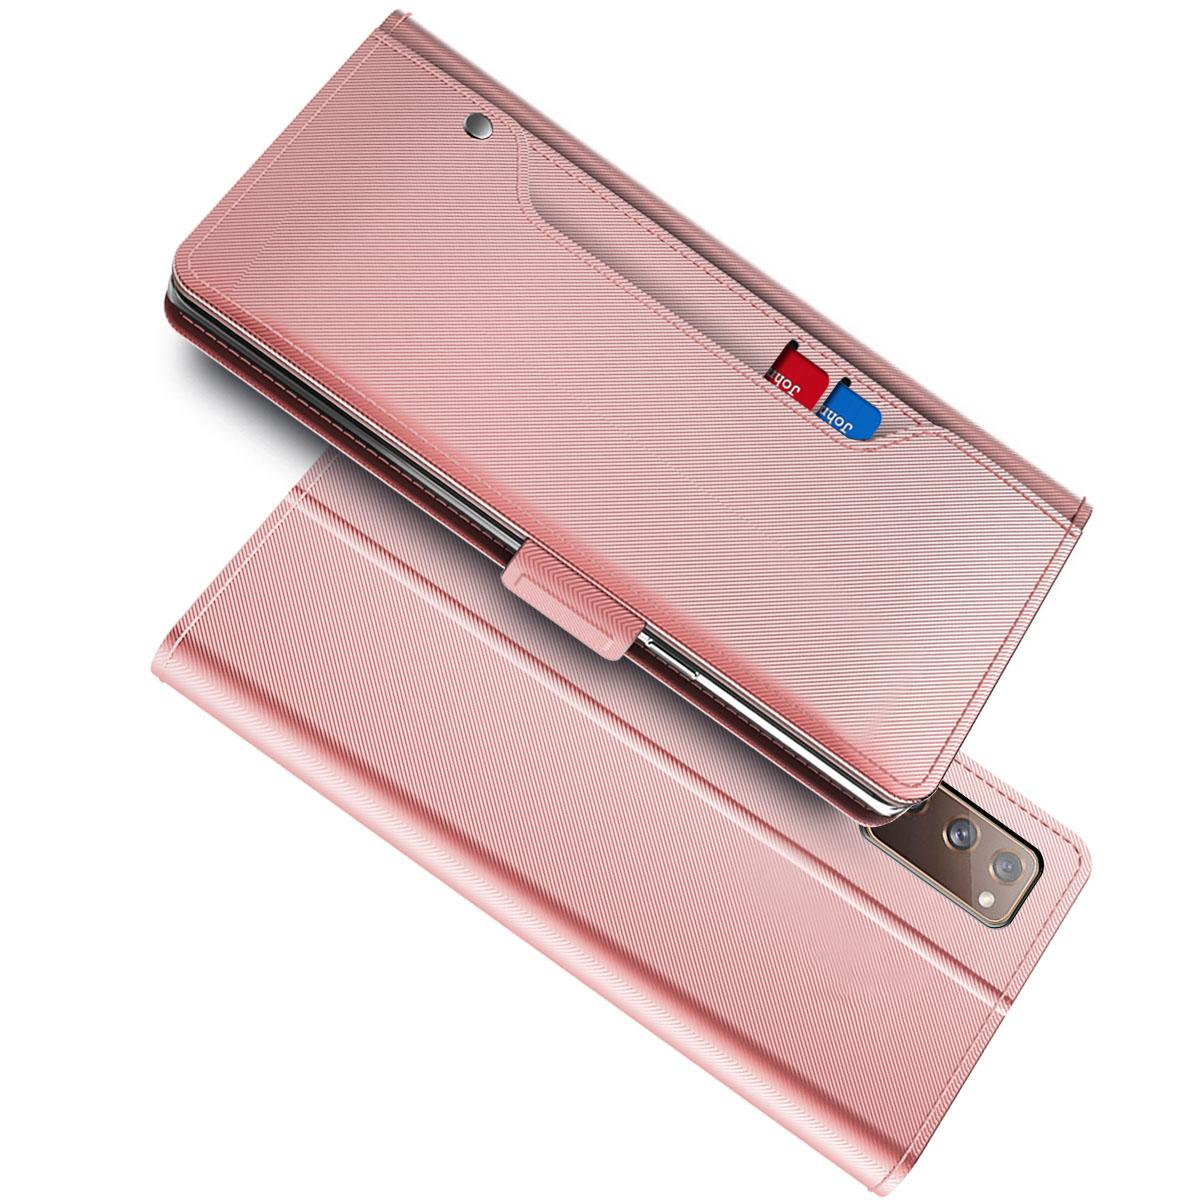 Suojakotelo Peili Galaxy A72 5G Vaaleanpunainen